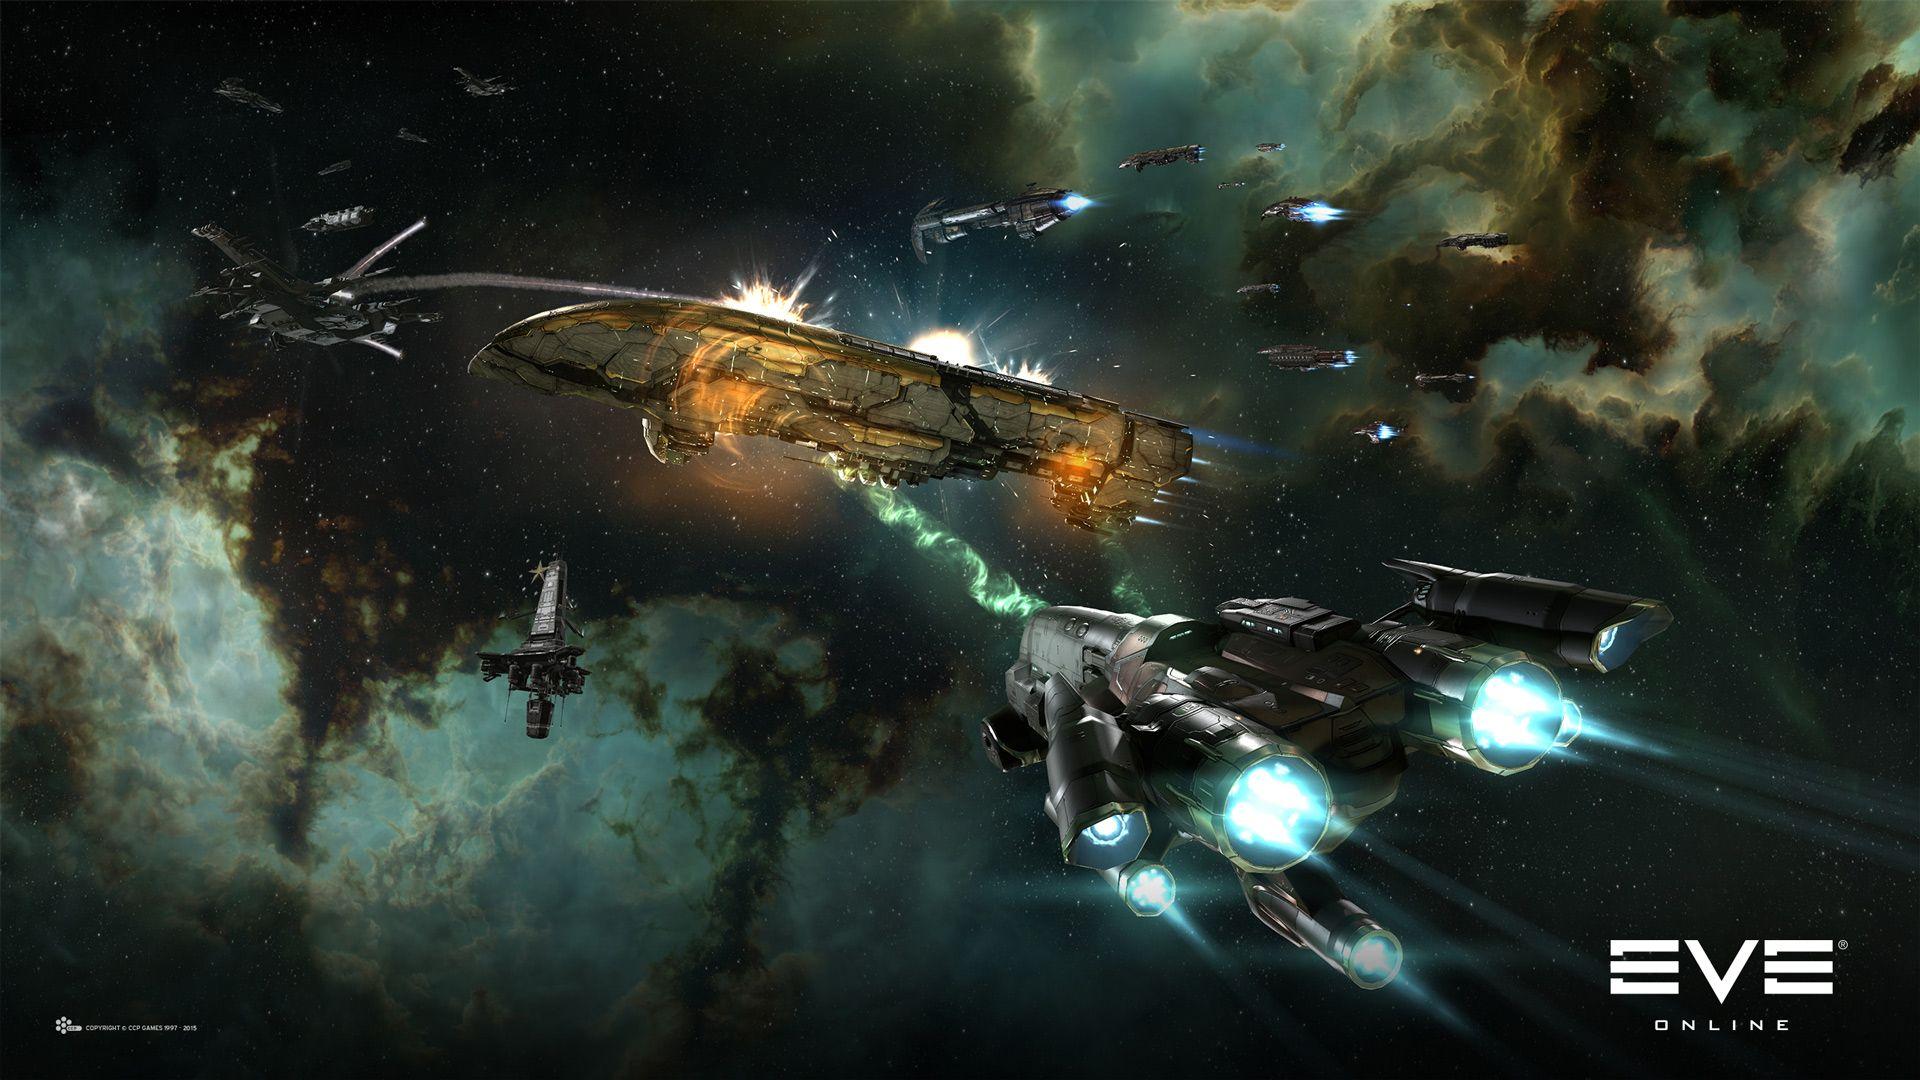 Eve Online Backgrounds Wallpaper